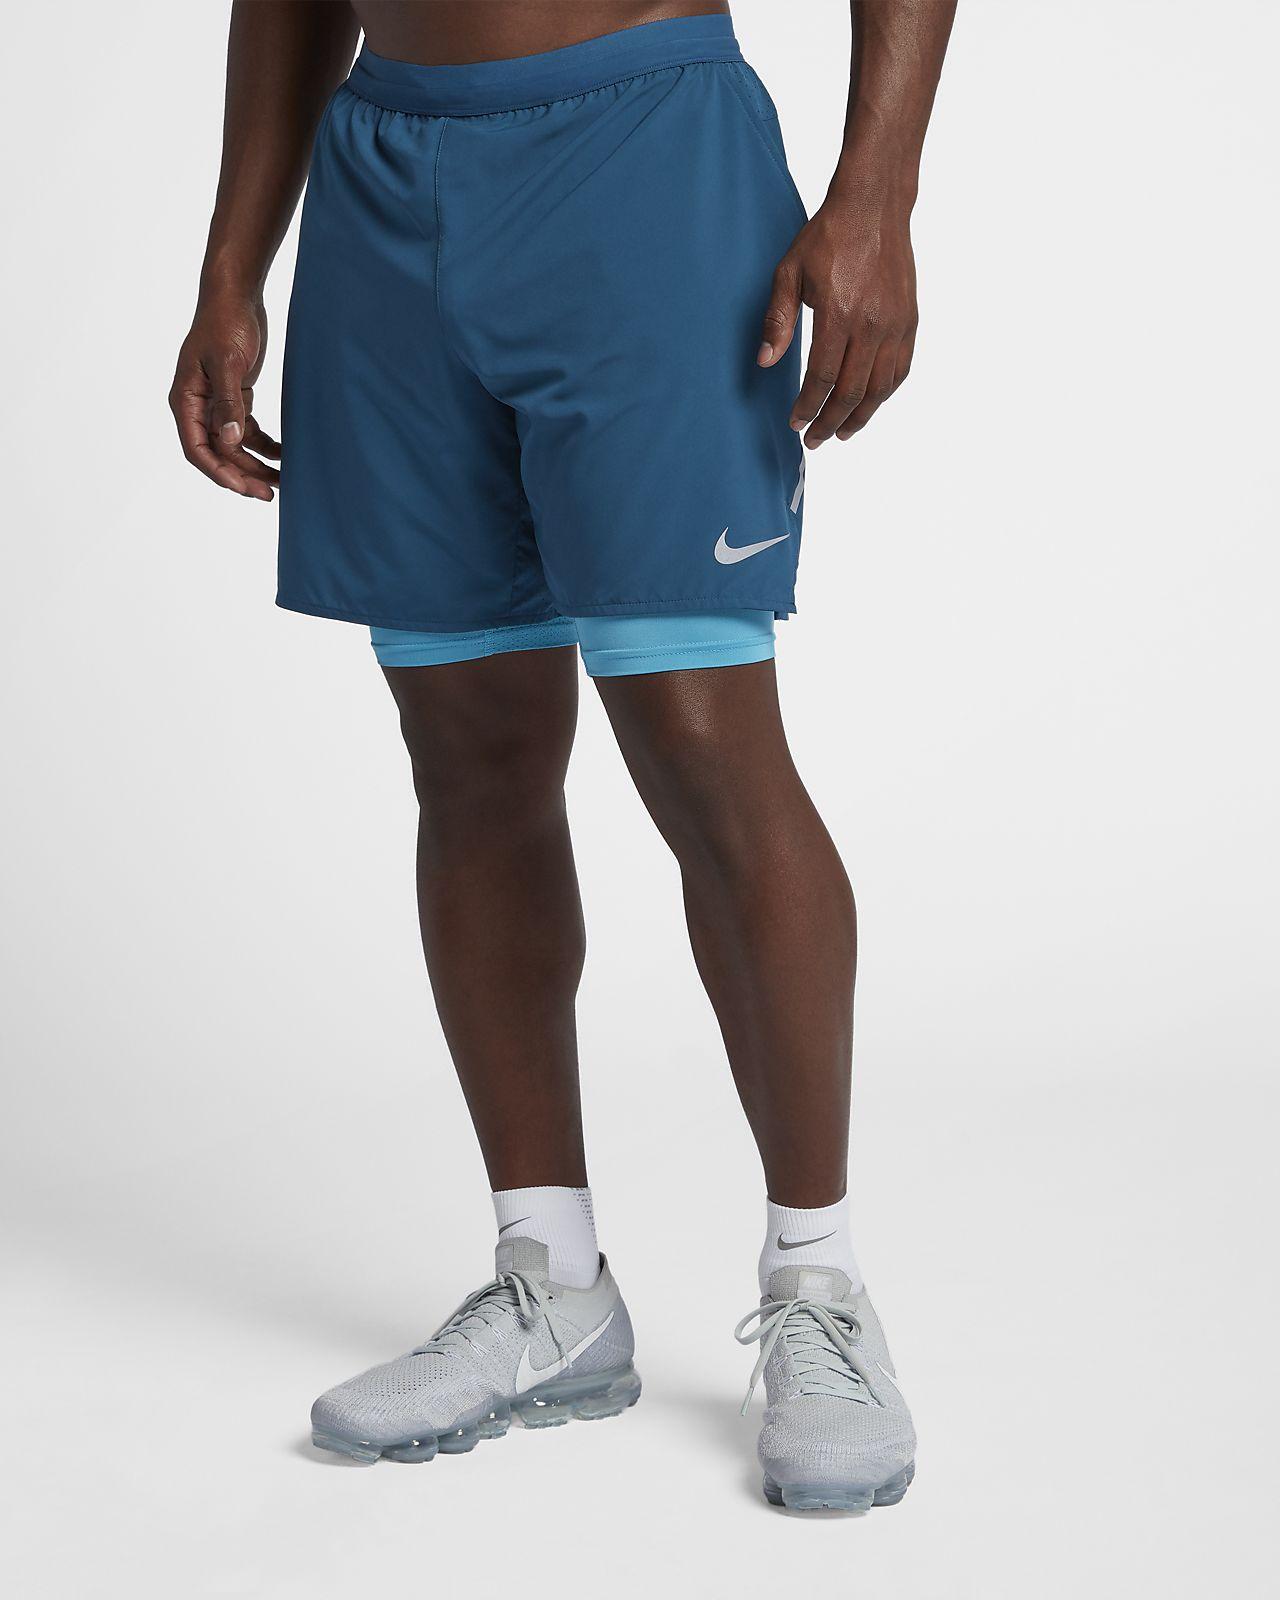 ed33a5bb9 Nike Flex Stride Pantalón corto de running 2 en 1 - Hombre. Nike.com ES